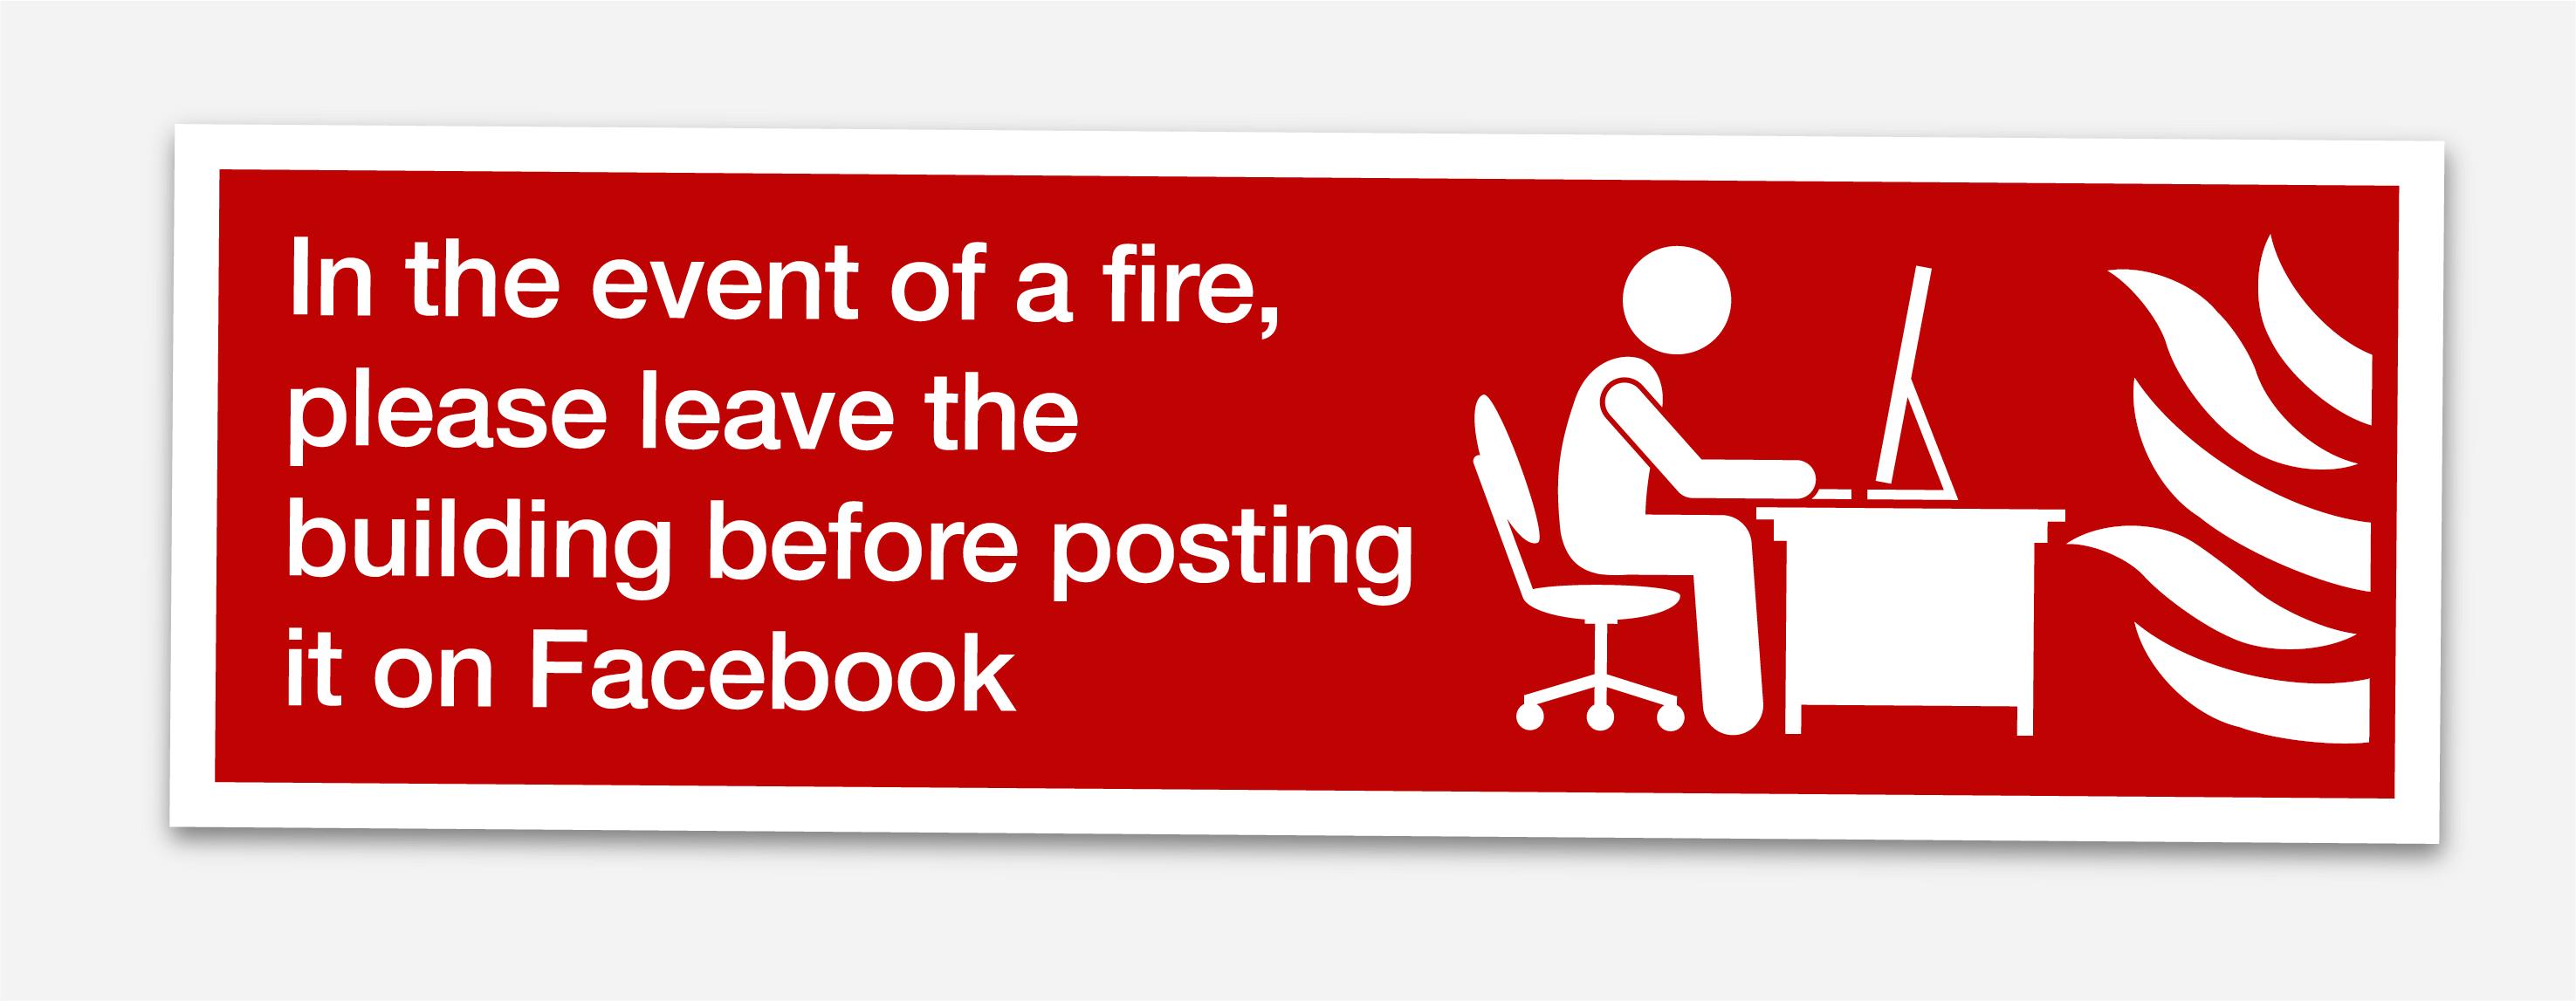 Facebook-fire